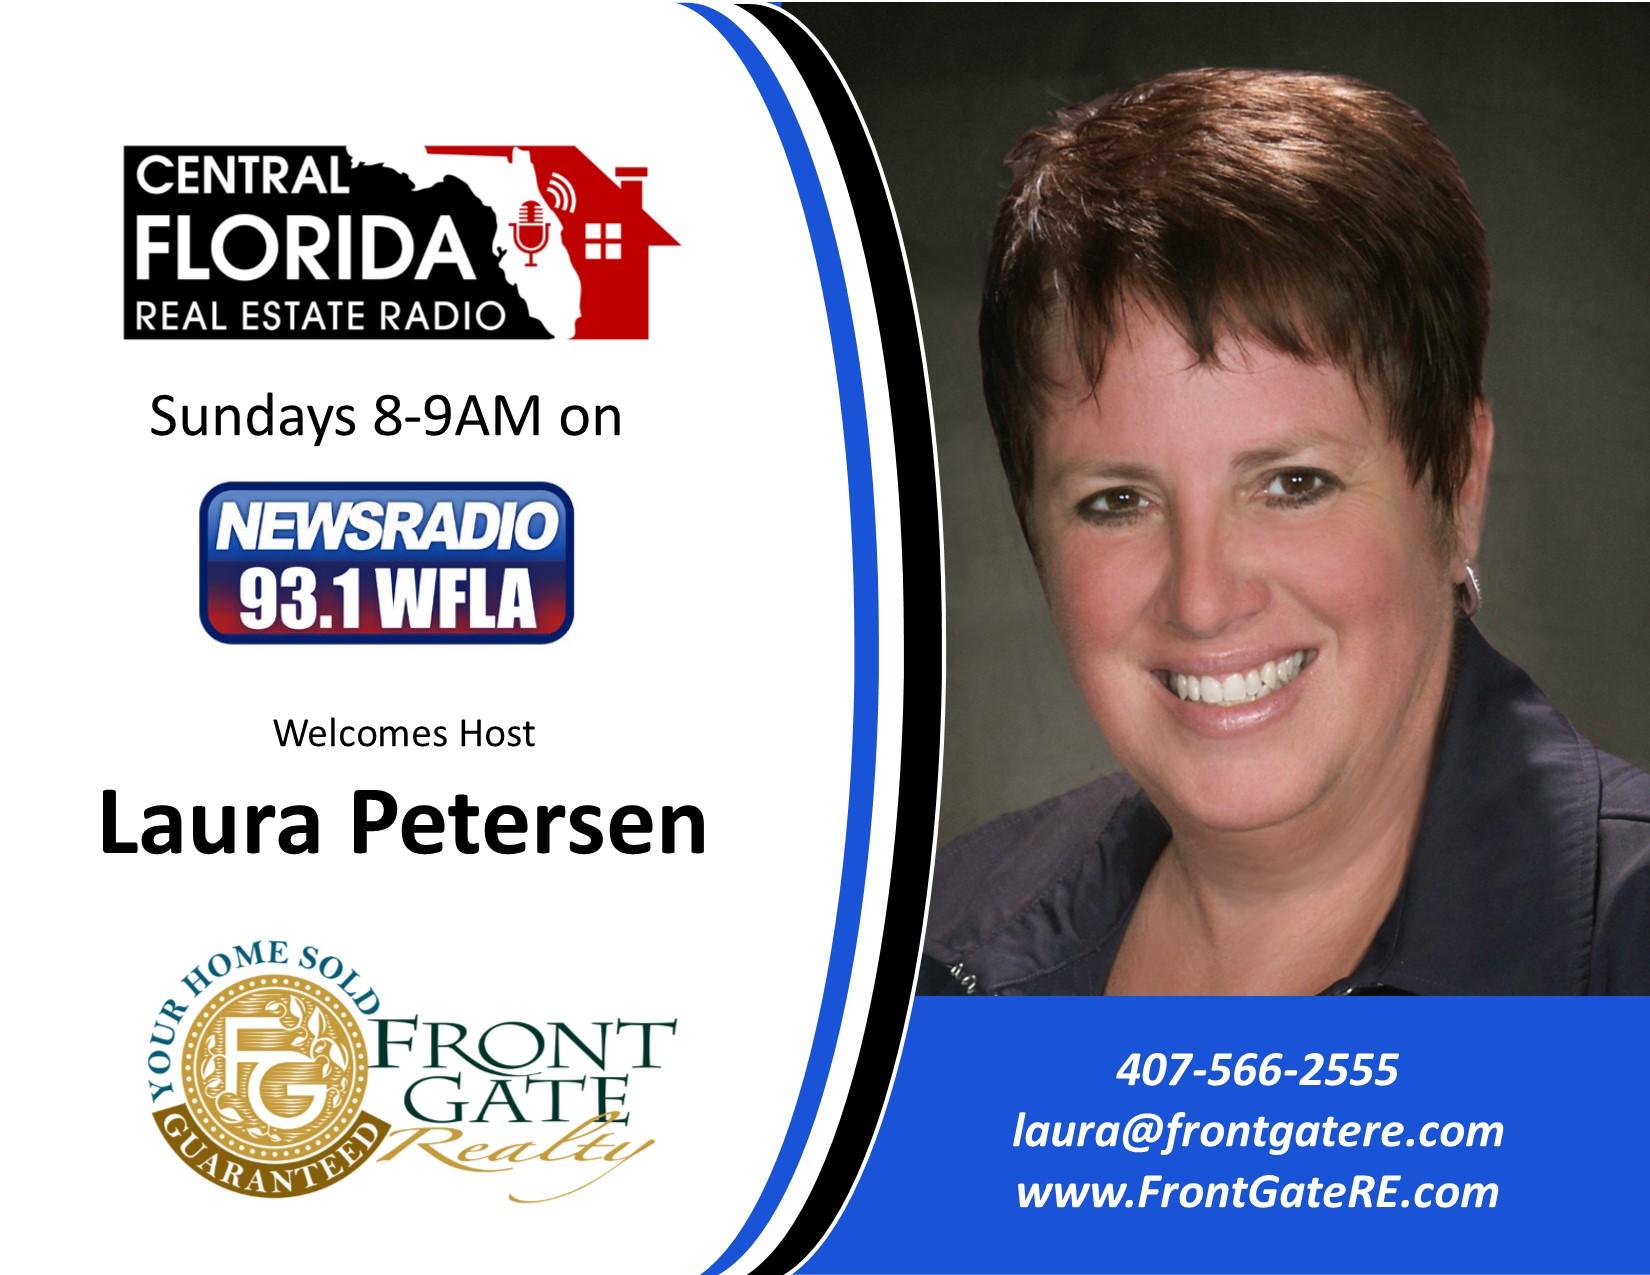 Central Florida Real Estate Radio 11/18/18